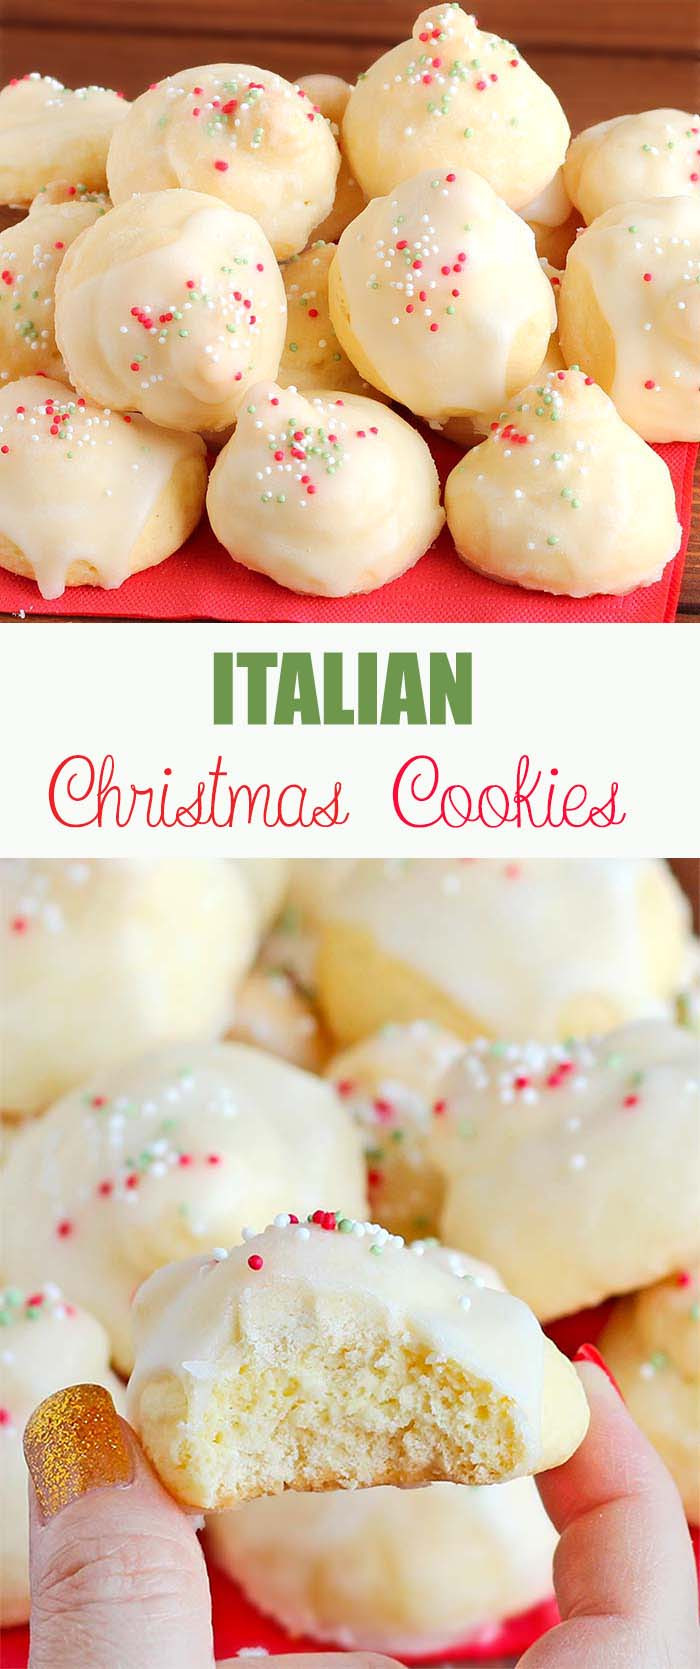 Italian Christmas Recipes  Italian Christmas Cookies Cakescottage